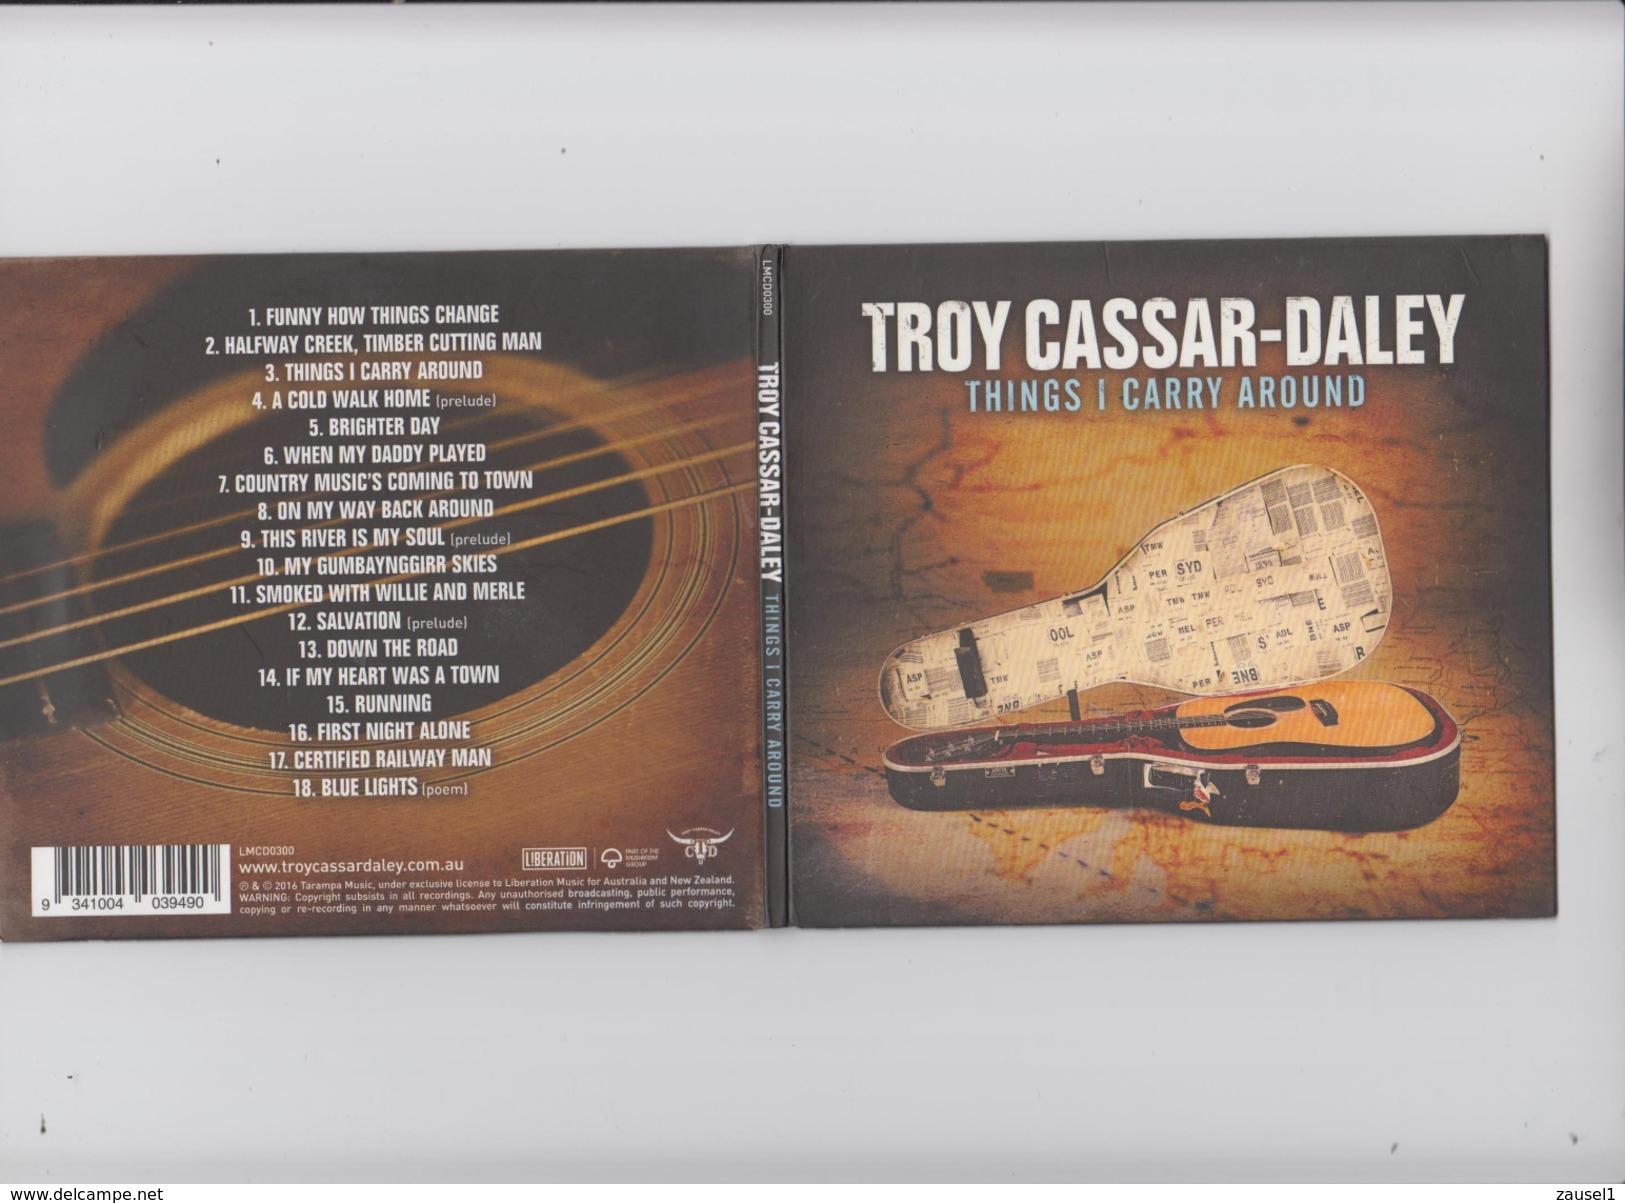 Troy Cassar-Daley - THINGS I CARRY AROUND - Original CD 2016 - Country & Folk